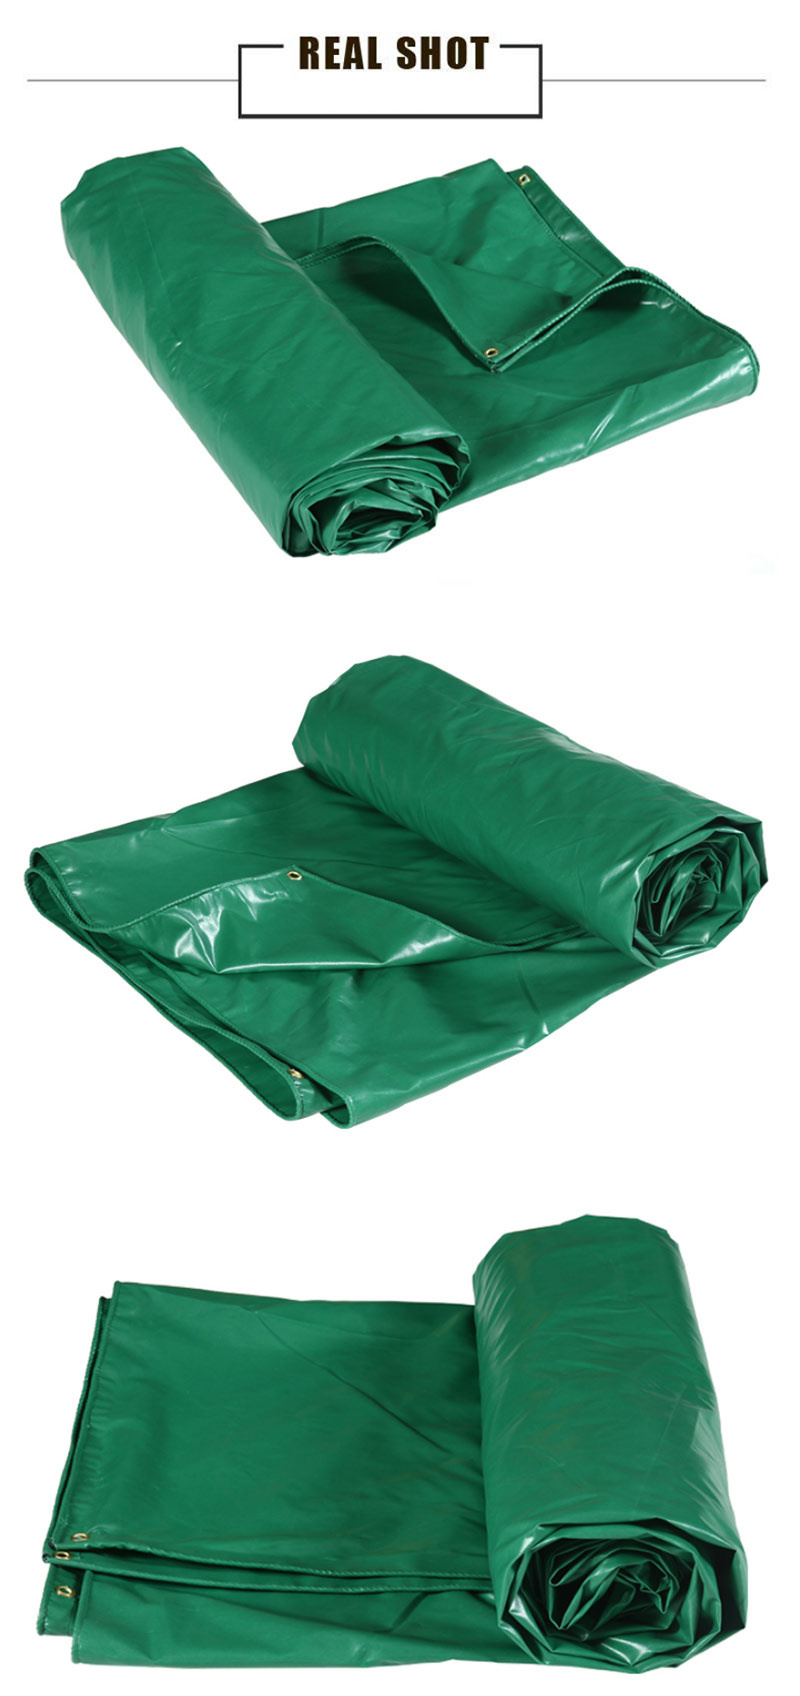 Heavy Duty Coated PVC Waterproof Tarpaulin/Tarp for Cover